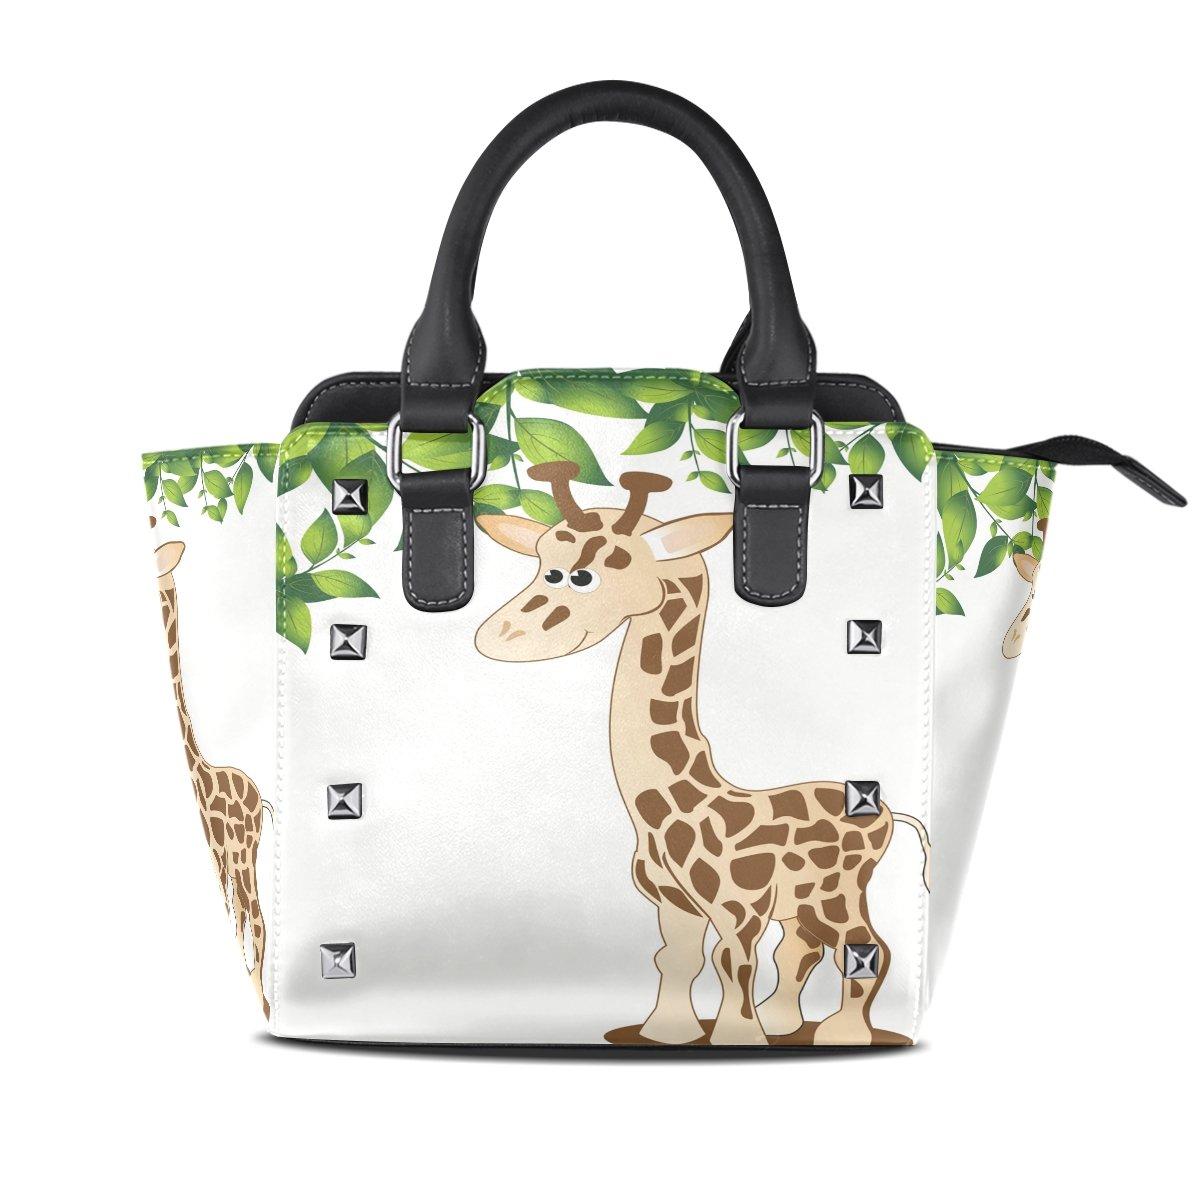 Womens Genuine Leather Hangbags Tote Bags Cute Giraffe Purse Shoulder Bags